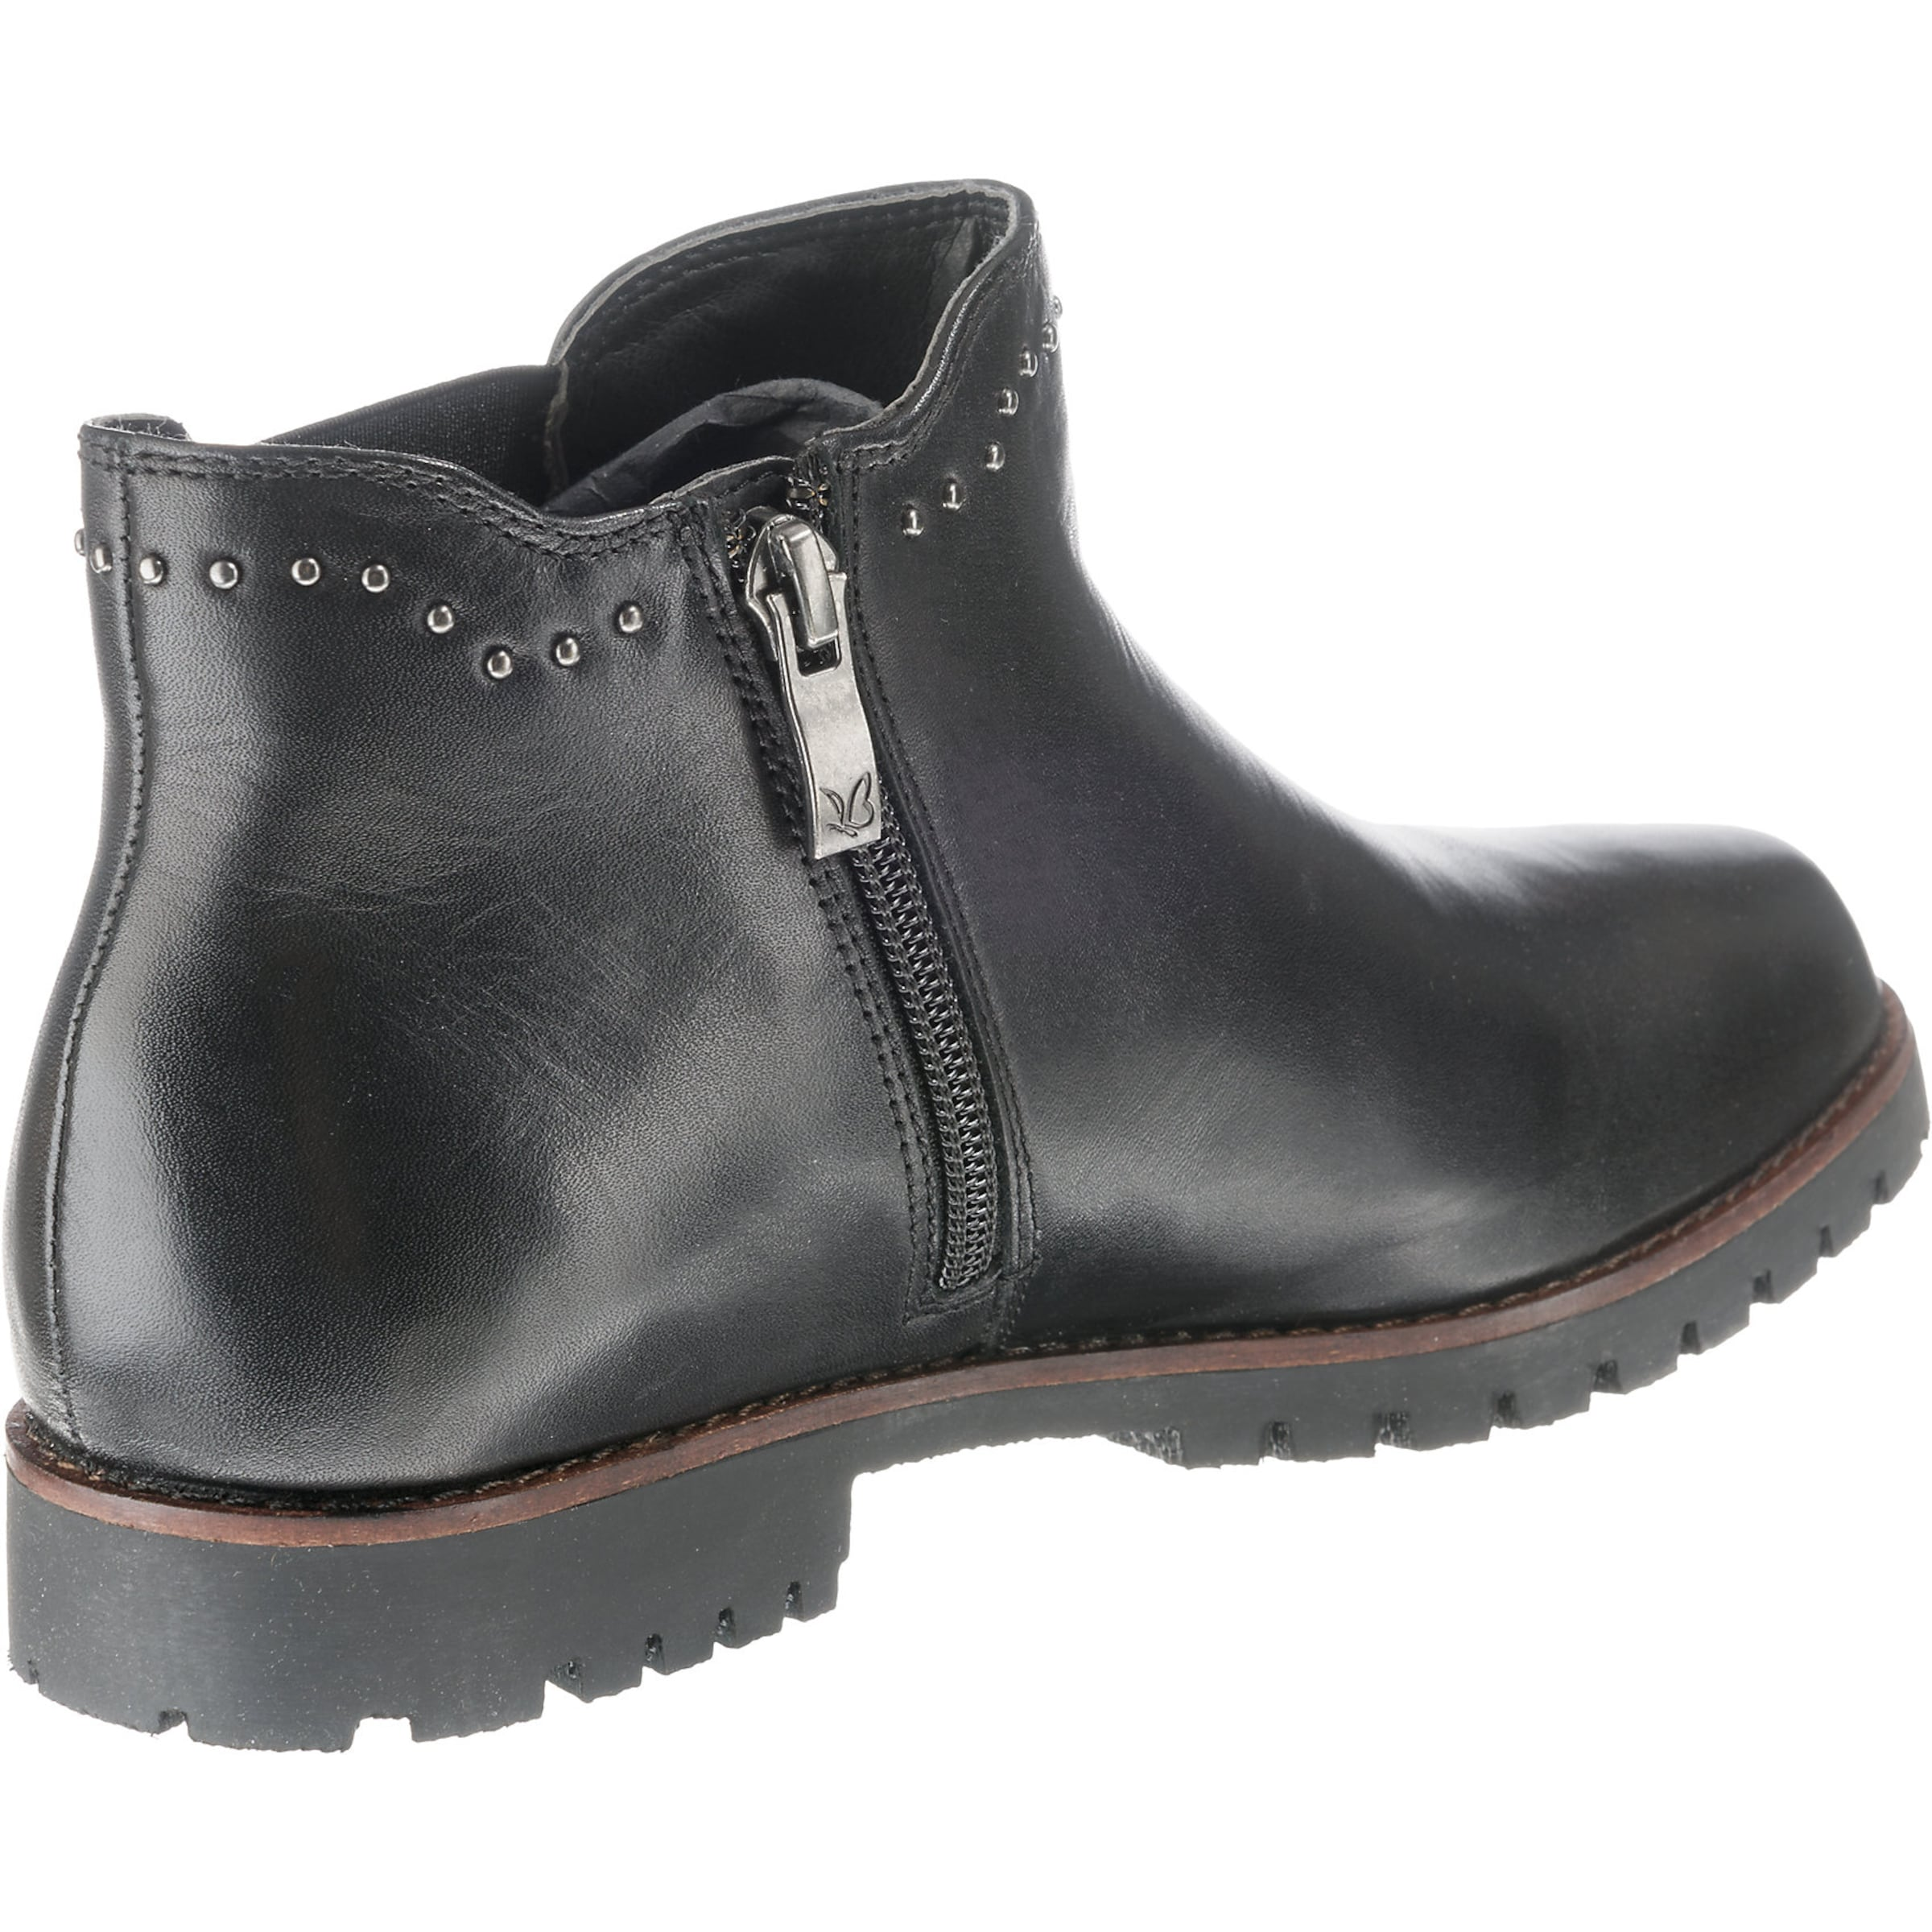 Boots En Caprice Chelsea Caprice Noir NkXn0O8wP